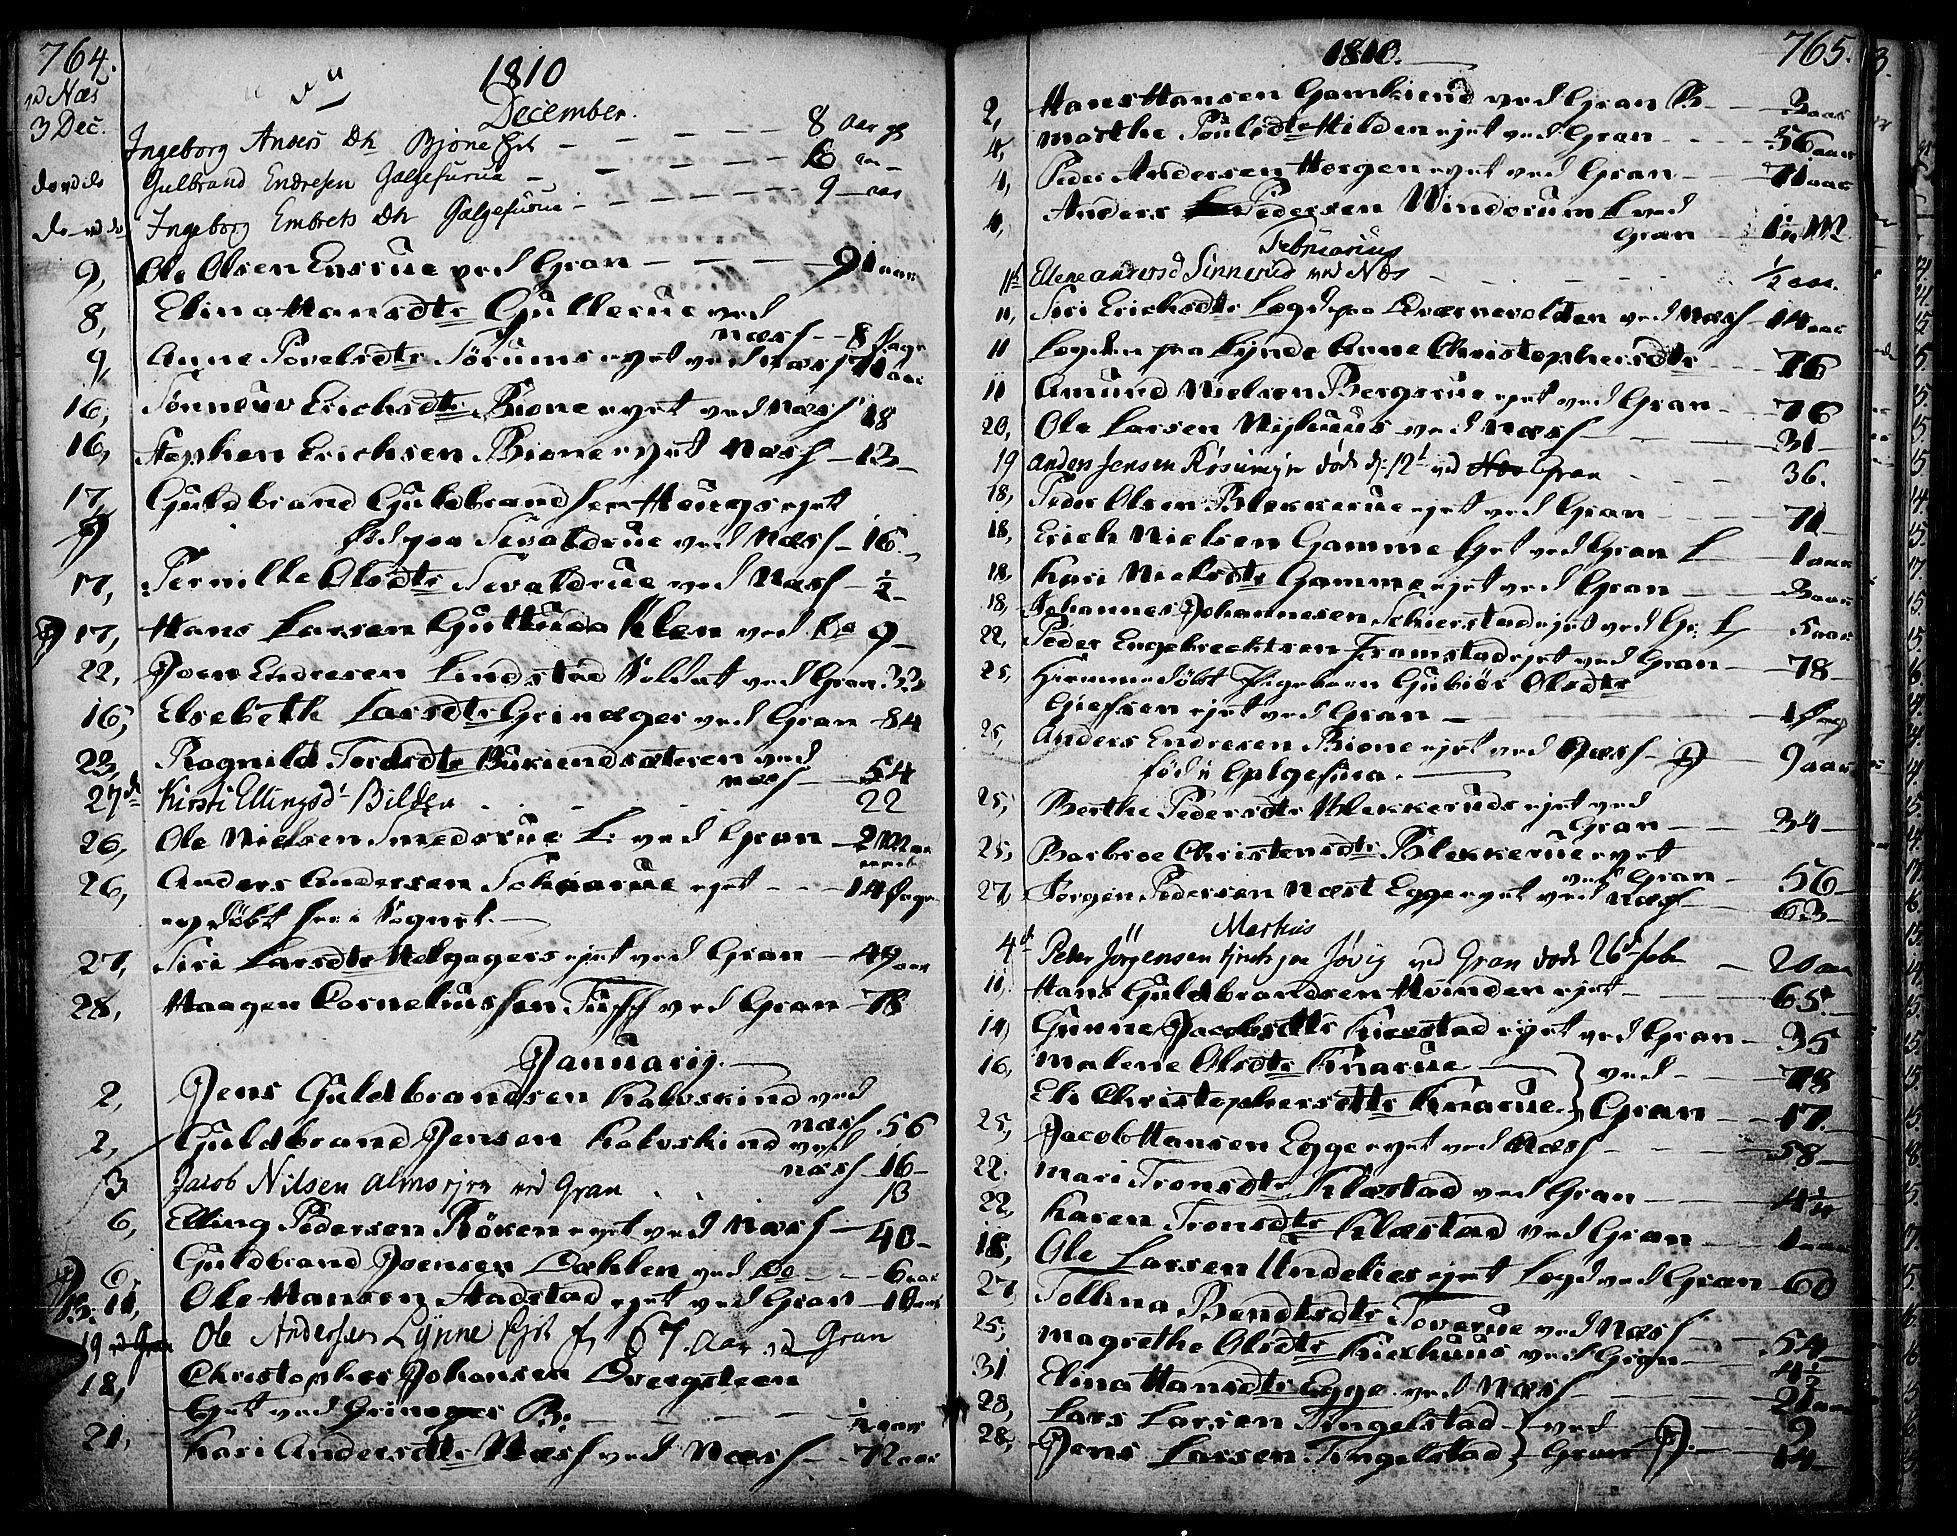 SAH, Gran prestekontor, Ministerialbok nr. 6, 1787-1824, s. 764-765